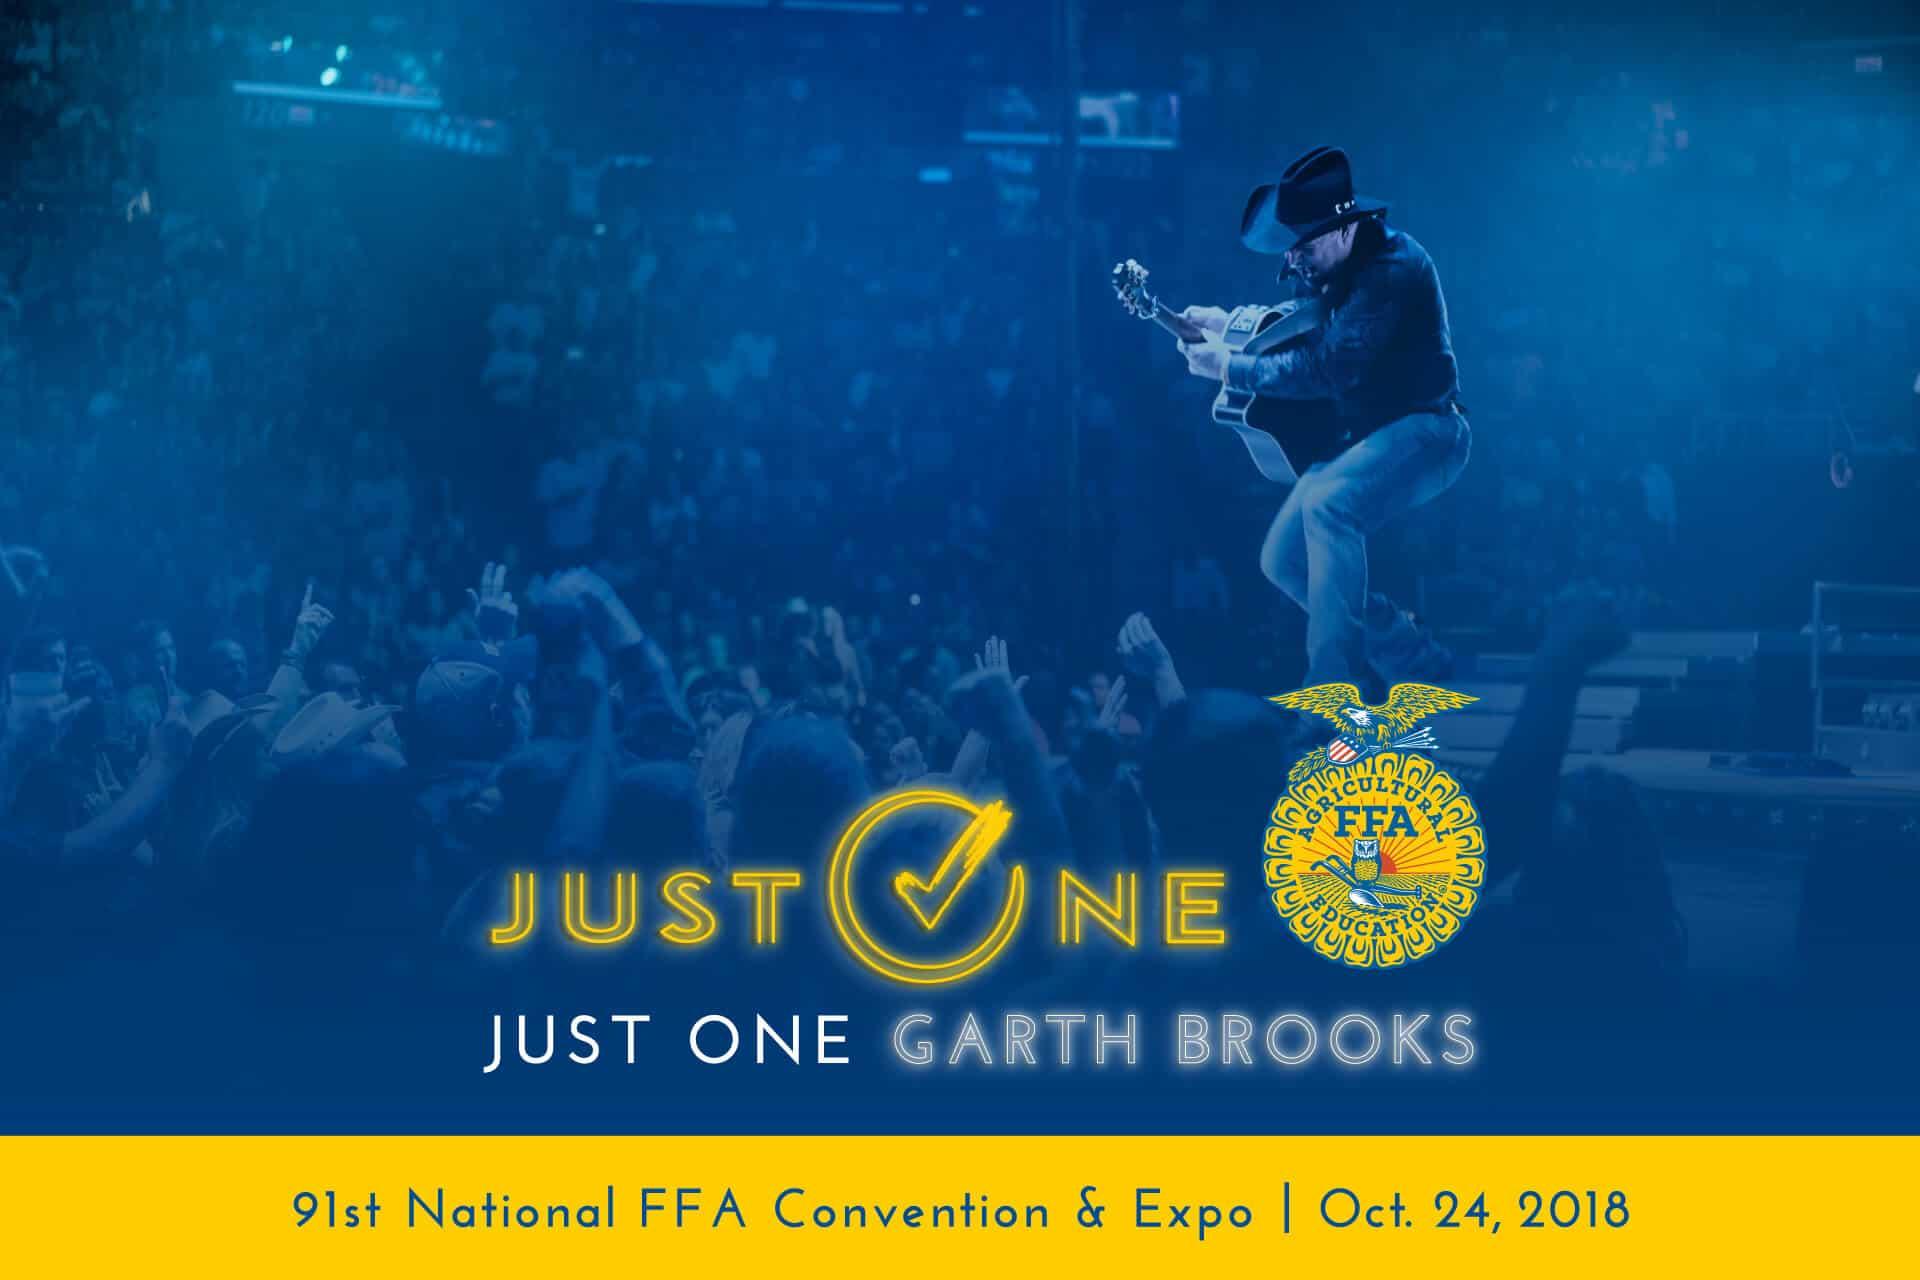 Garth Brooks Concert Announcement